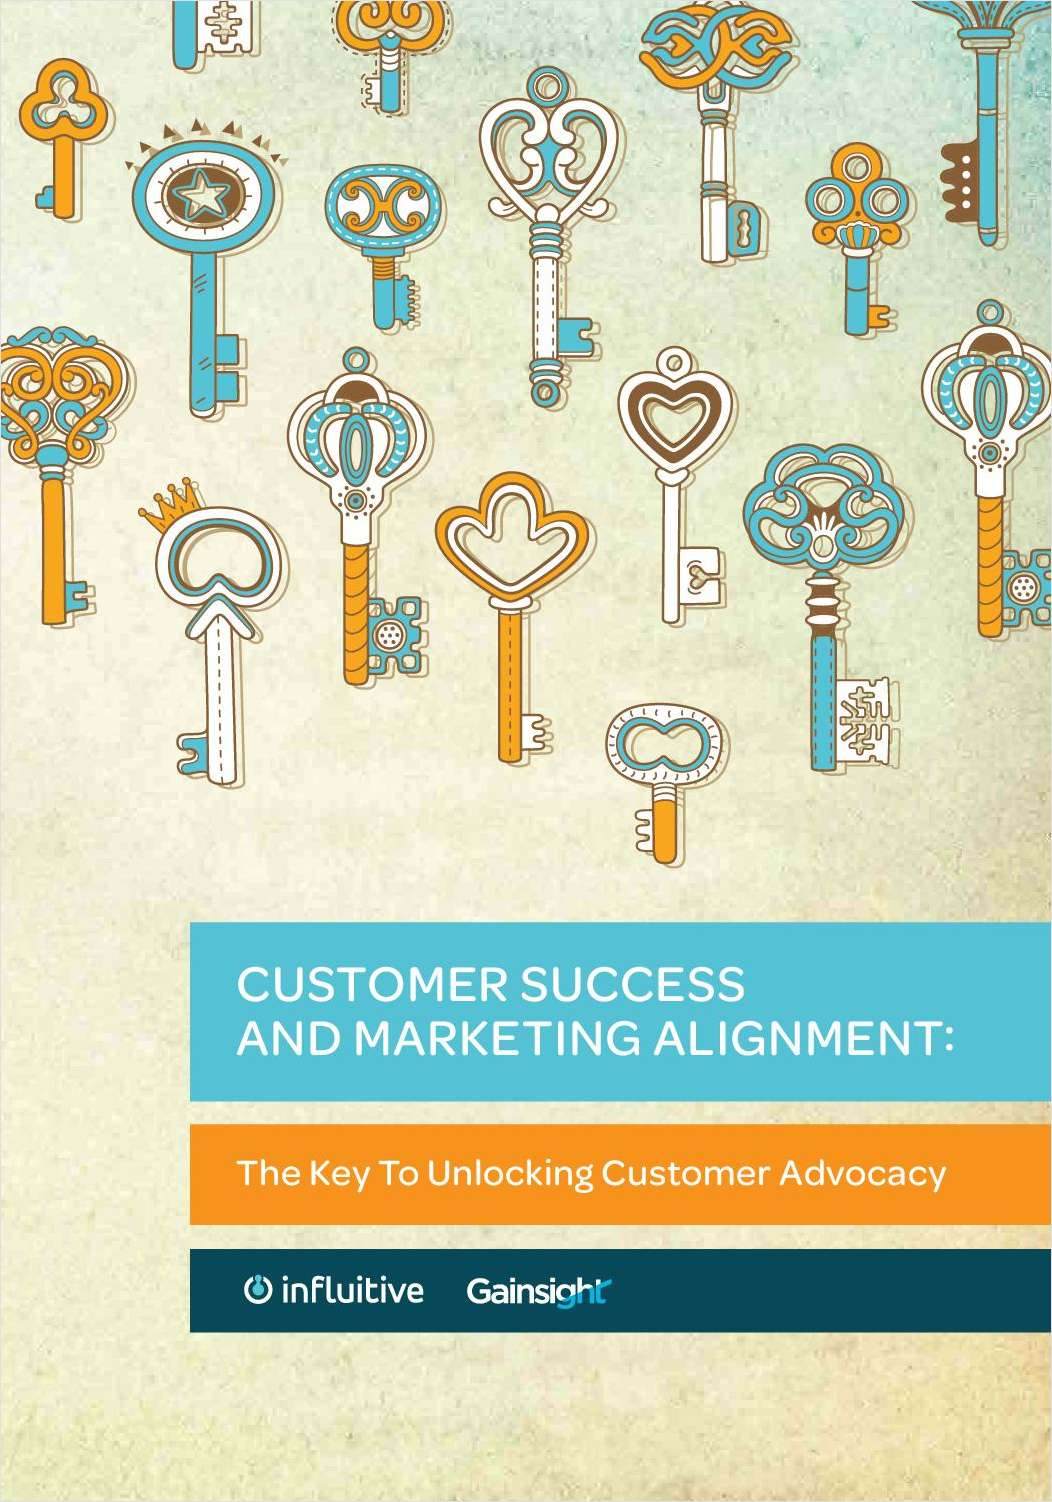 Customer Success and Marketing Alignment: The Key to Unlocking Customer Advocacy